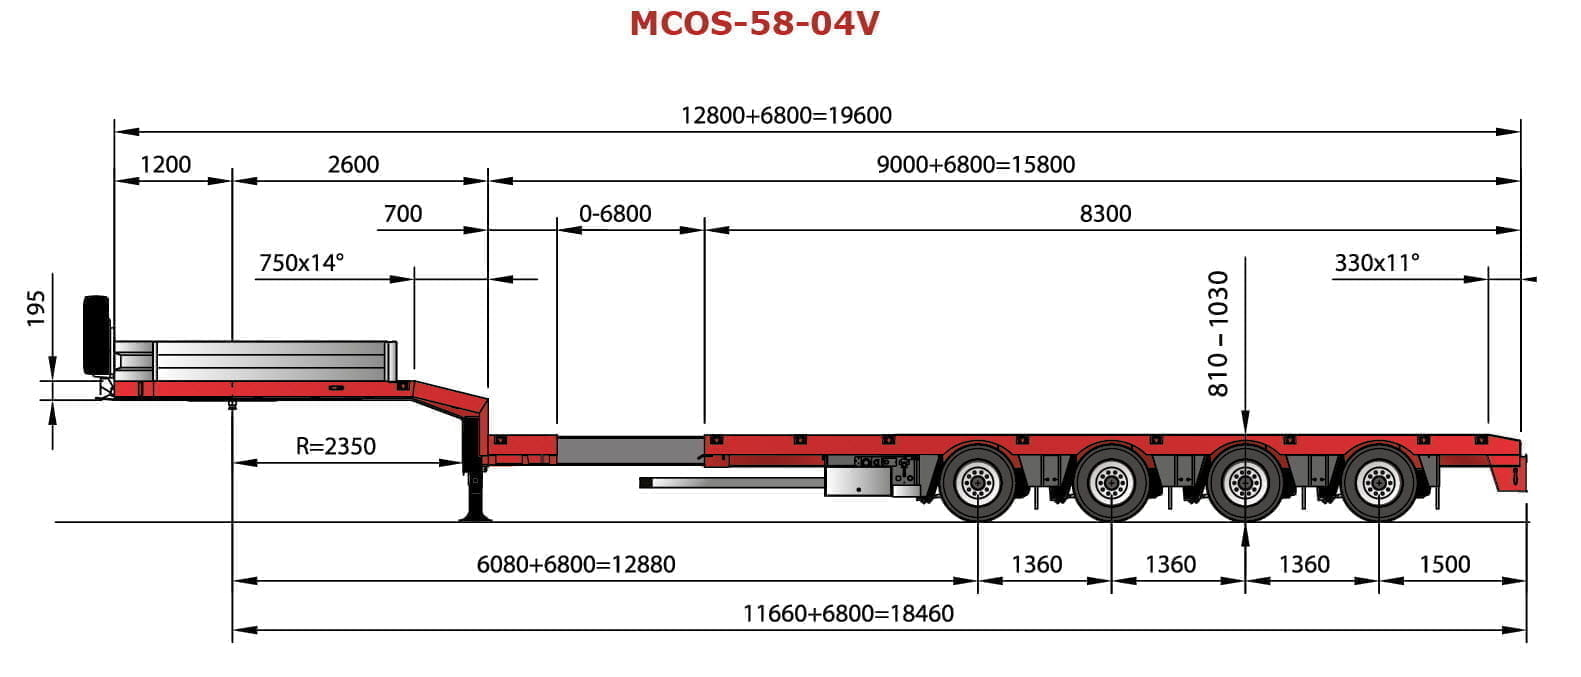 mcos-58-04V